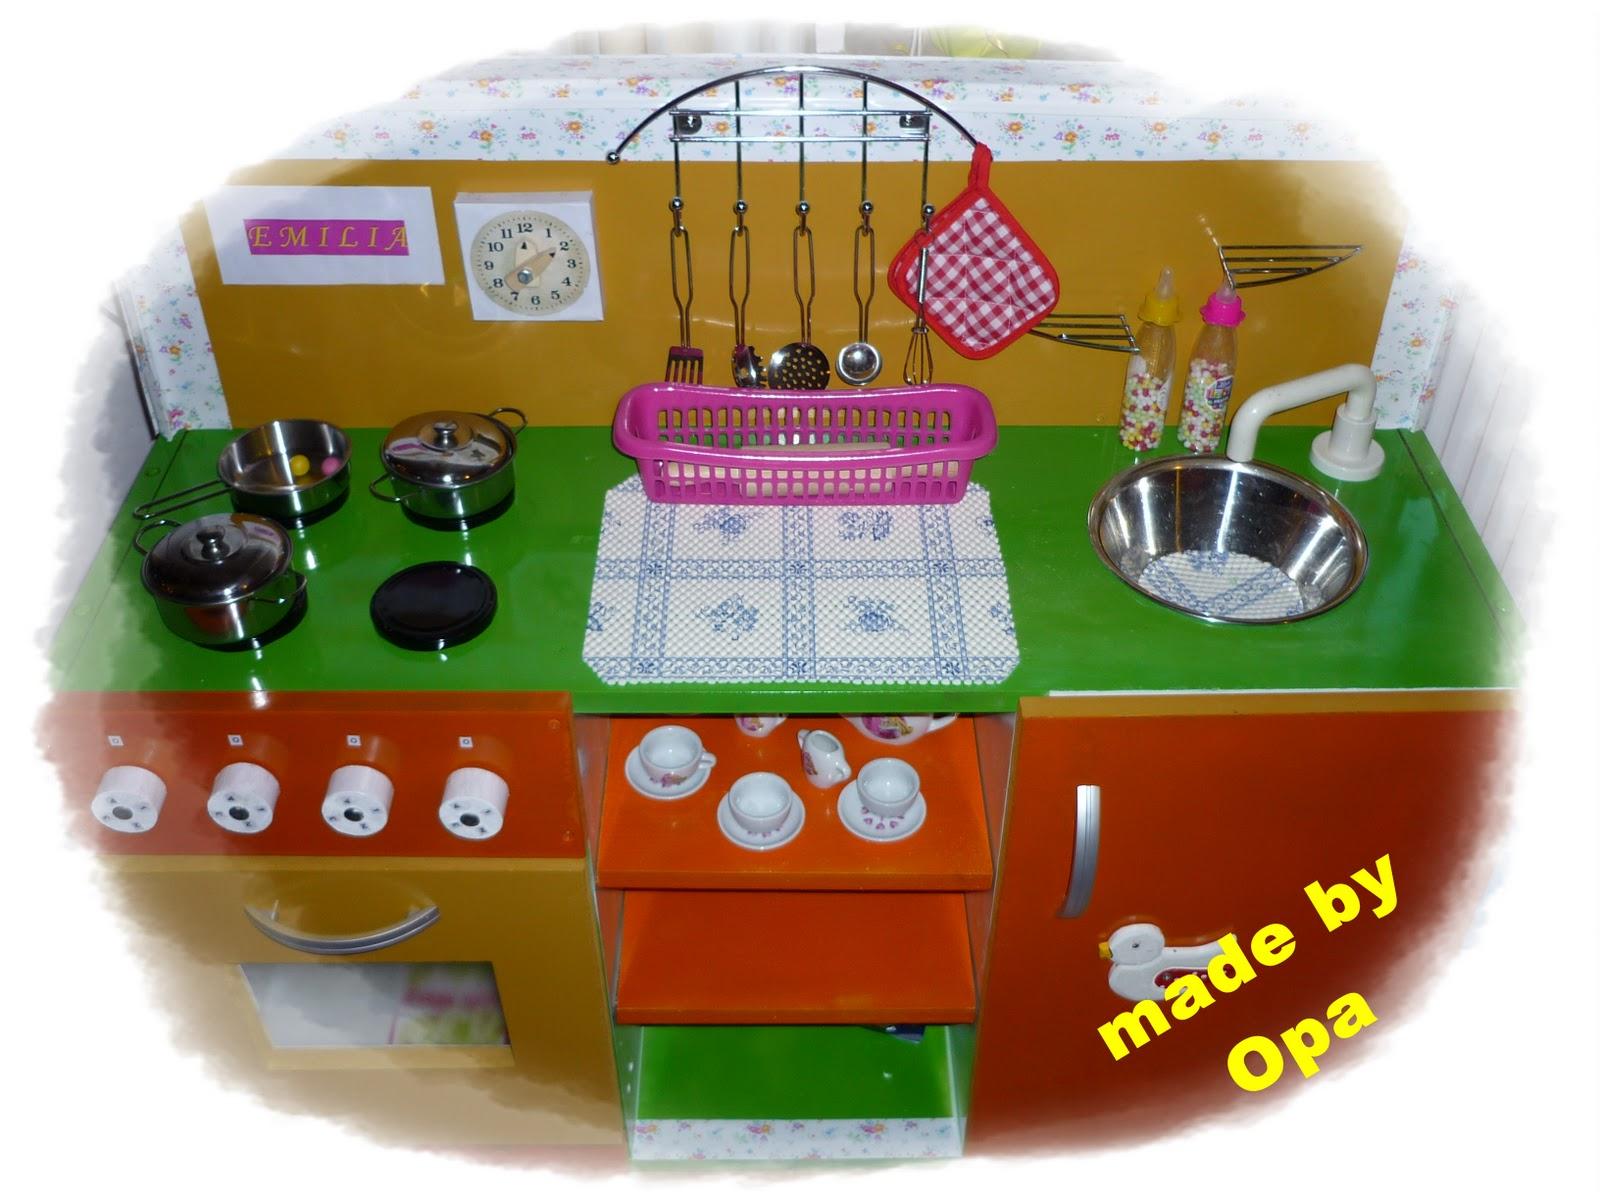 made by mutschka der g nsebraten ist gerettet. Black Bedroom Furniture Sets. Home Design Ideas